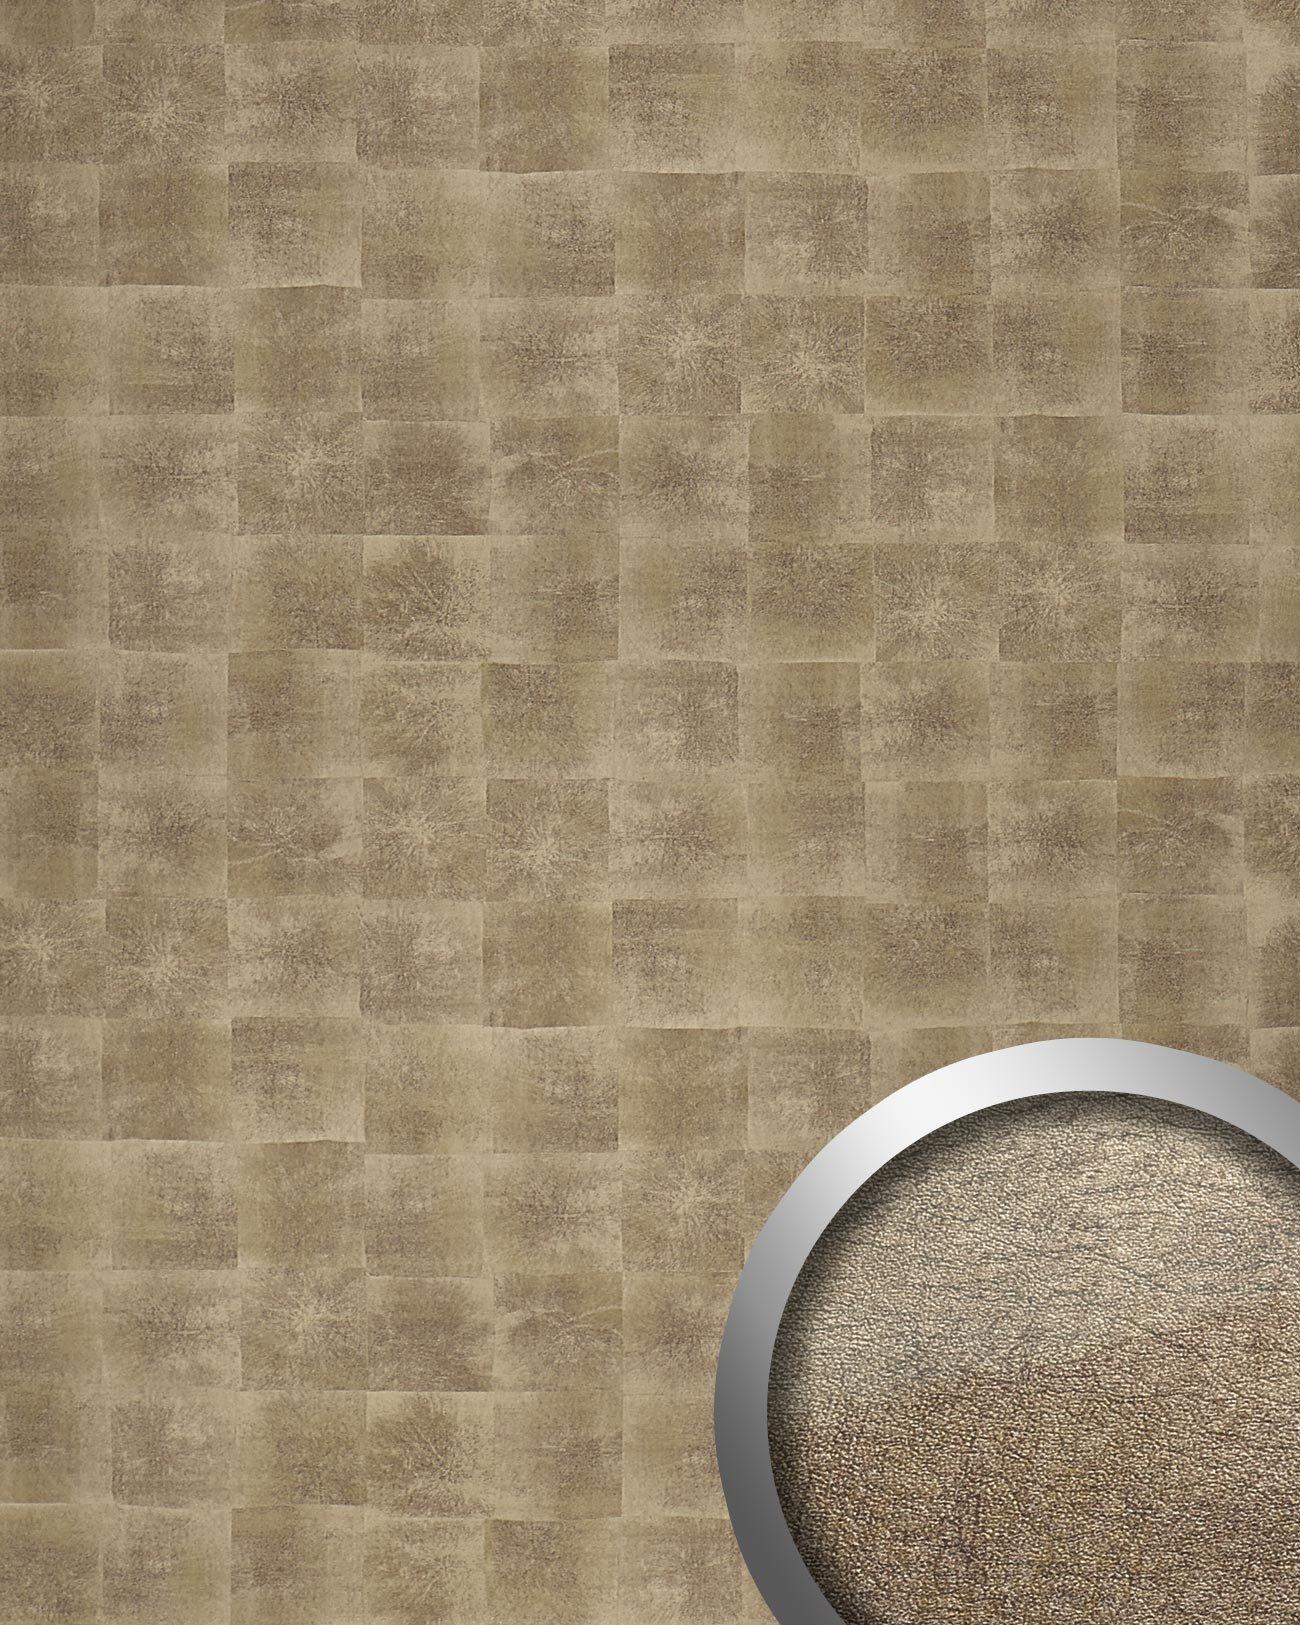 WallFace 17846 DECO LUXURY Wall panel self-adhesive Metal design Luxury wallcovering self-adhesive bronze   2,60 sqm